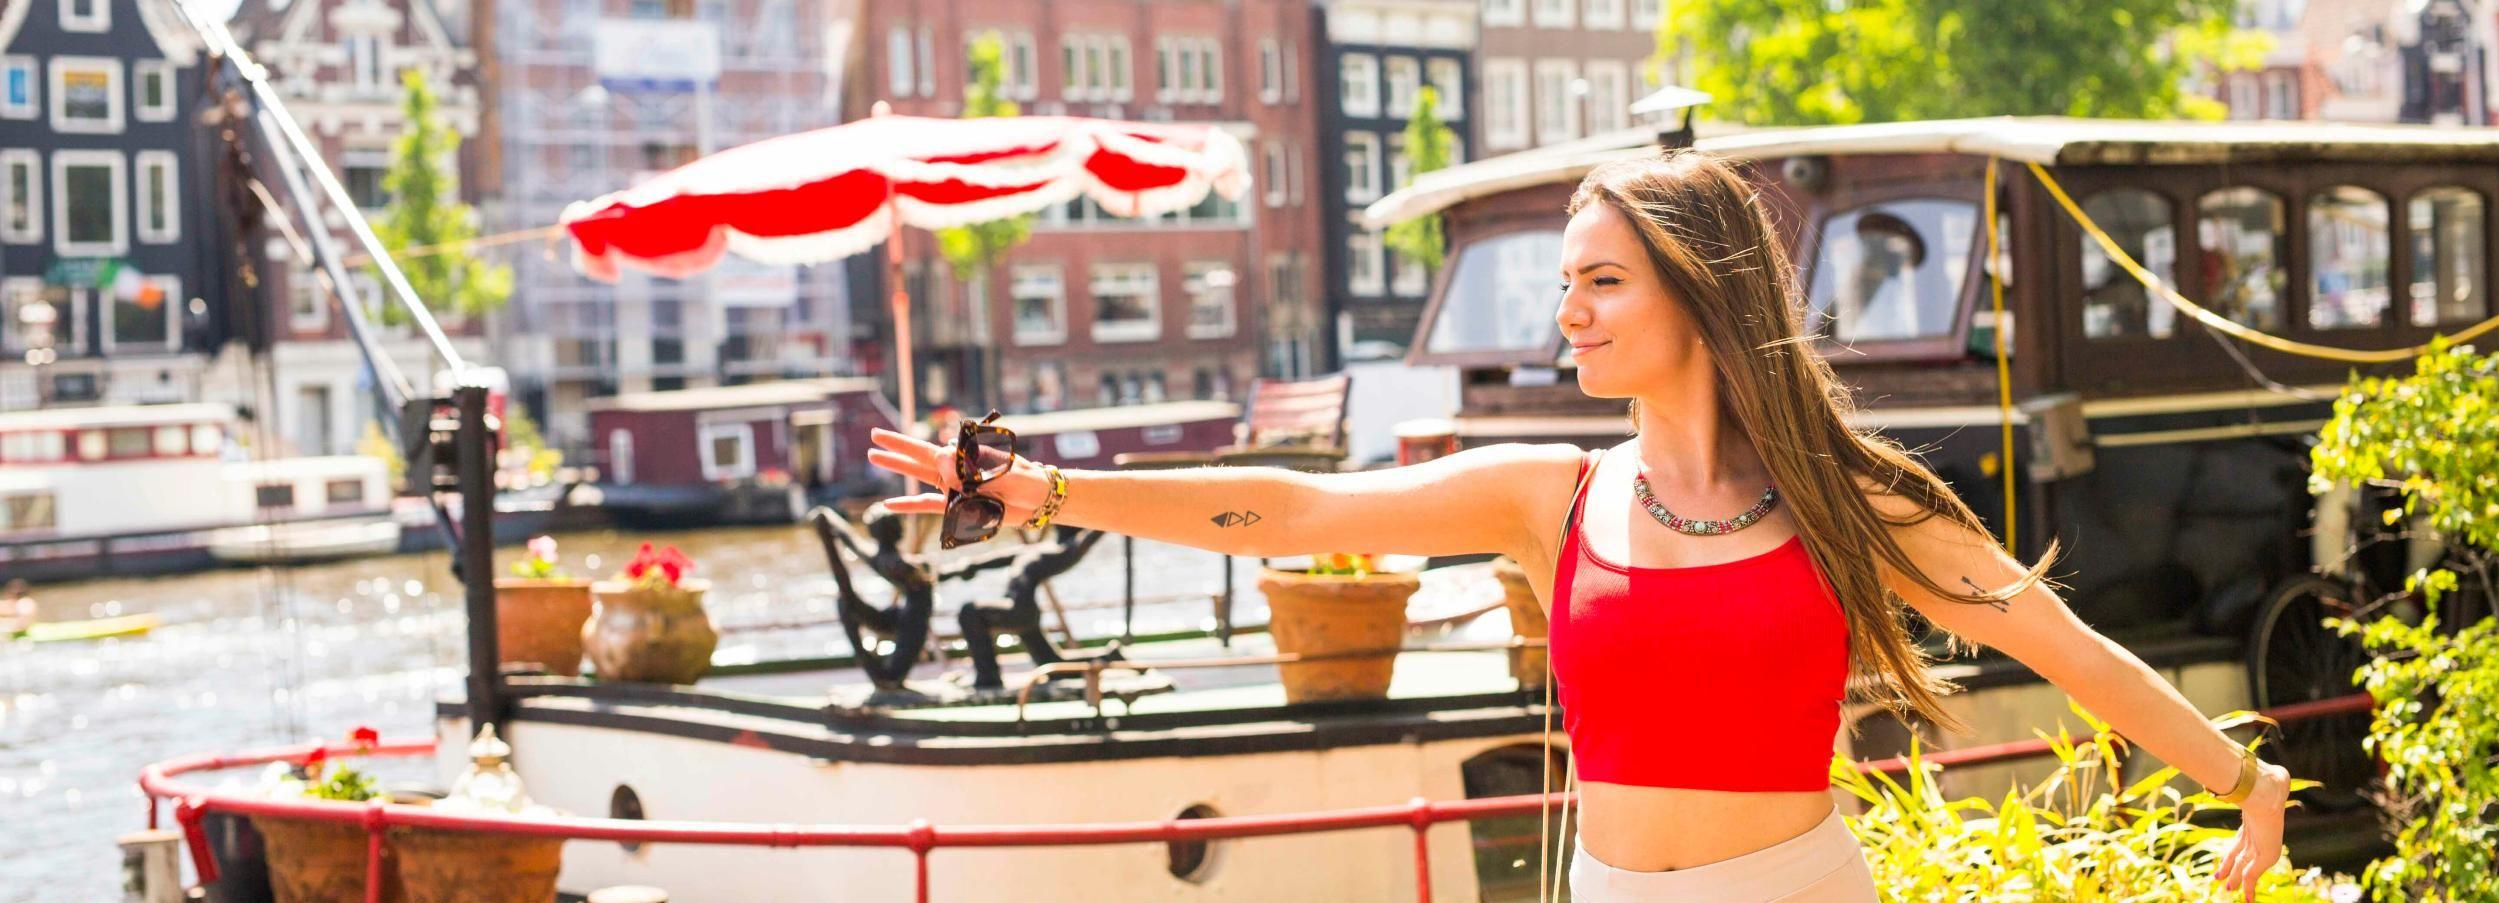 Amsterdam: Instagram Scenic Photo Spots & Moco Museum Tour